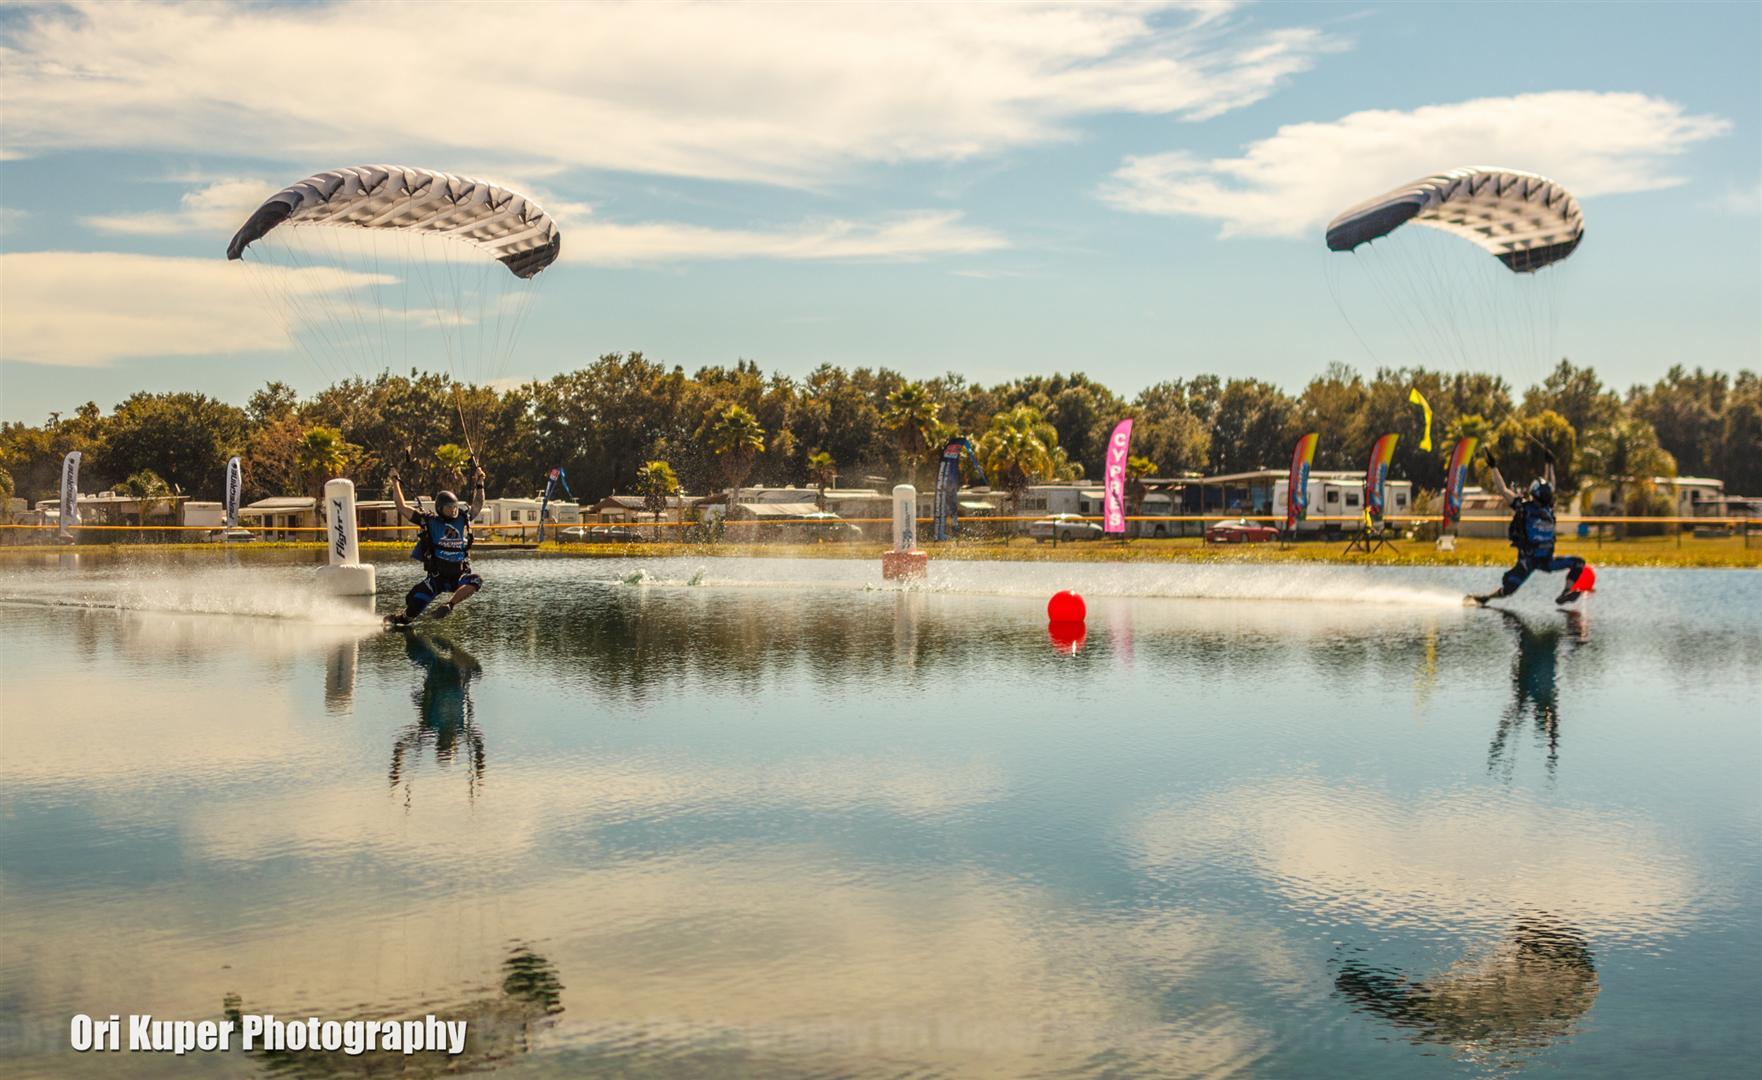 Ori Kuper Photography IMG_7891.jpg